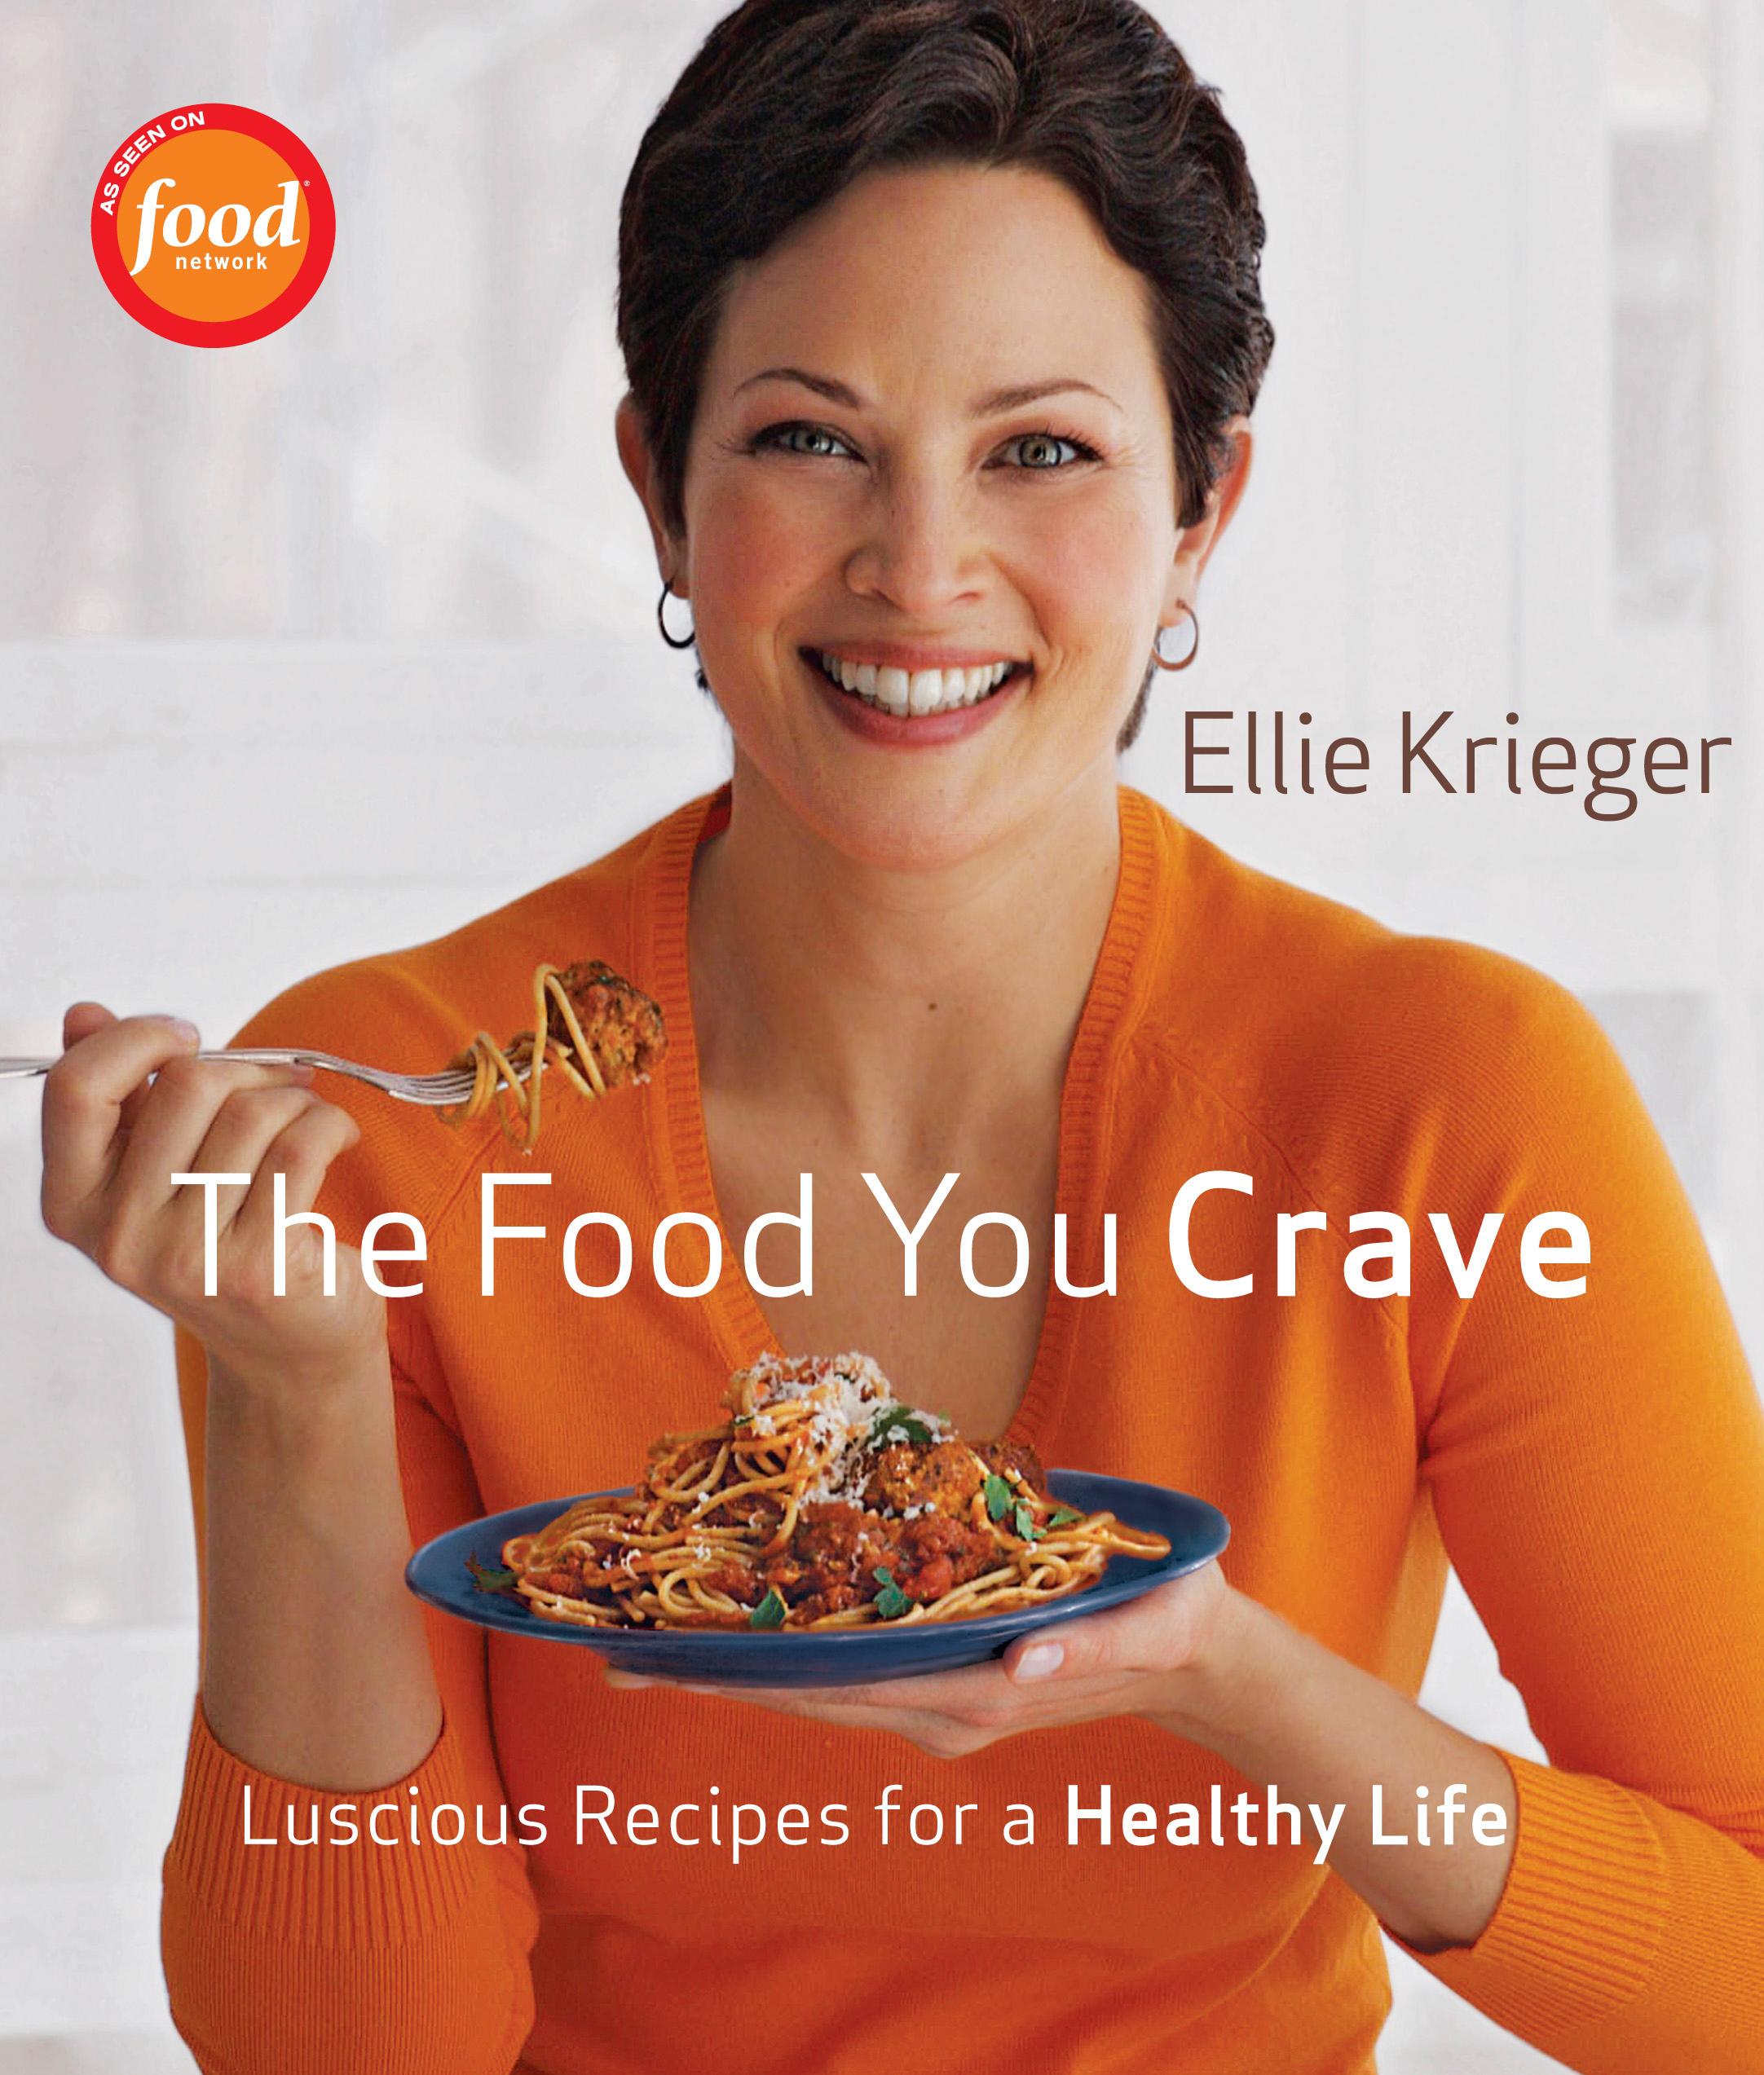 The Food You Crave - Ellie Krieger